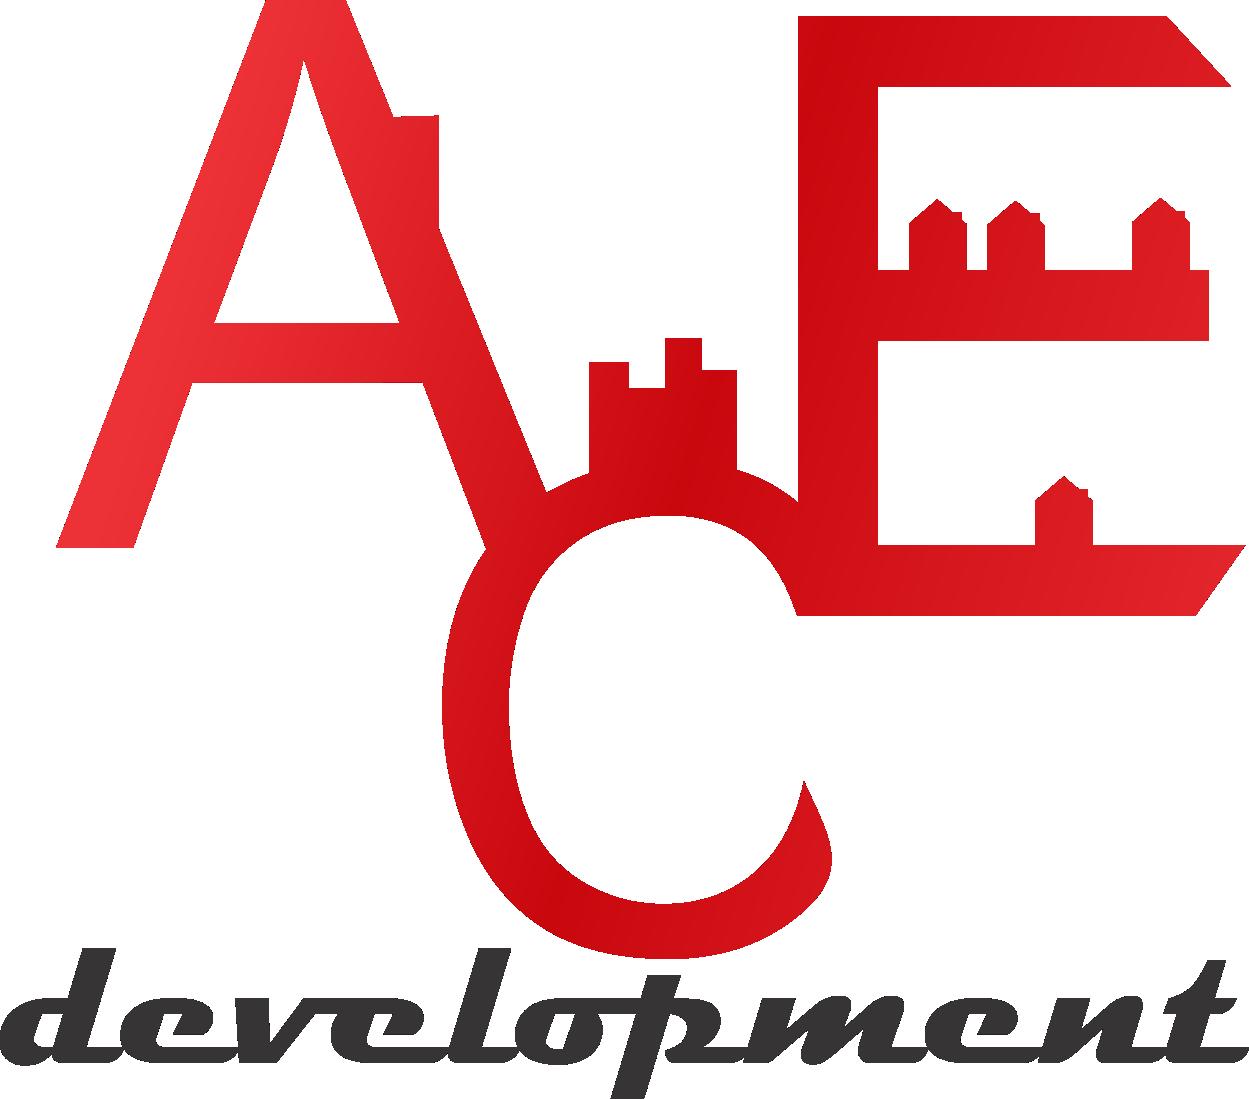 Logo Design by Rudy Permana - Entry No. 68 in the Logo Design Contest Fun Logo Design for Ace development.